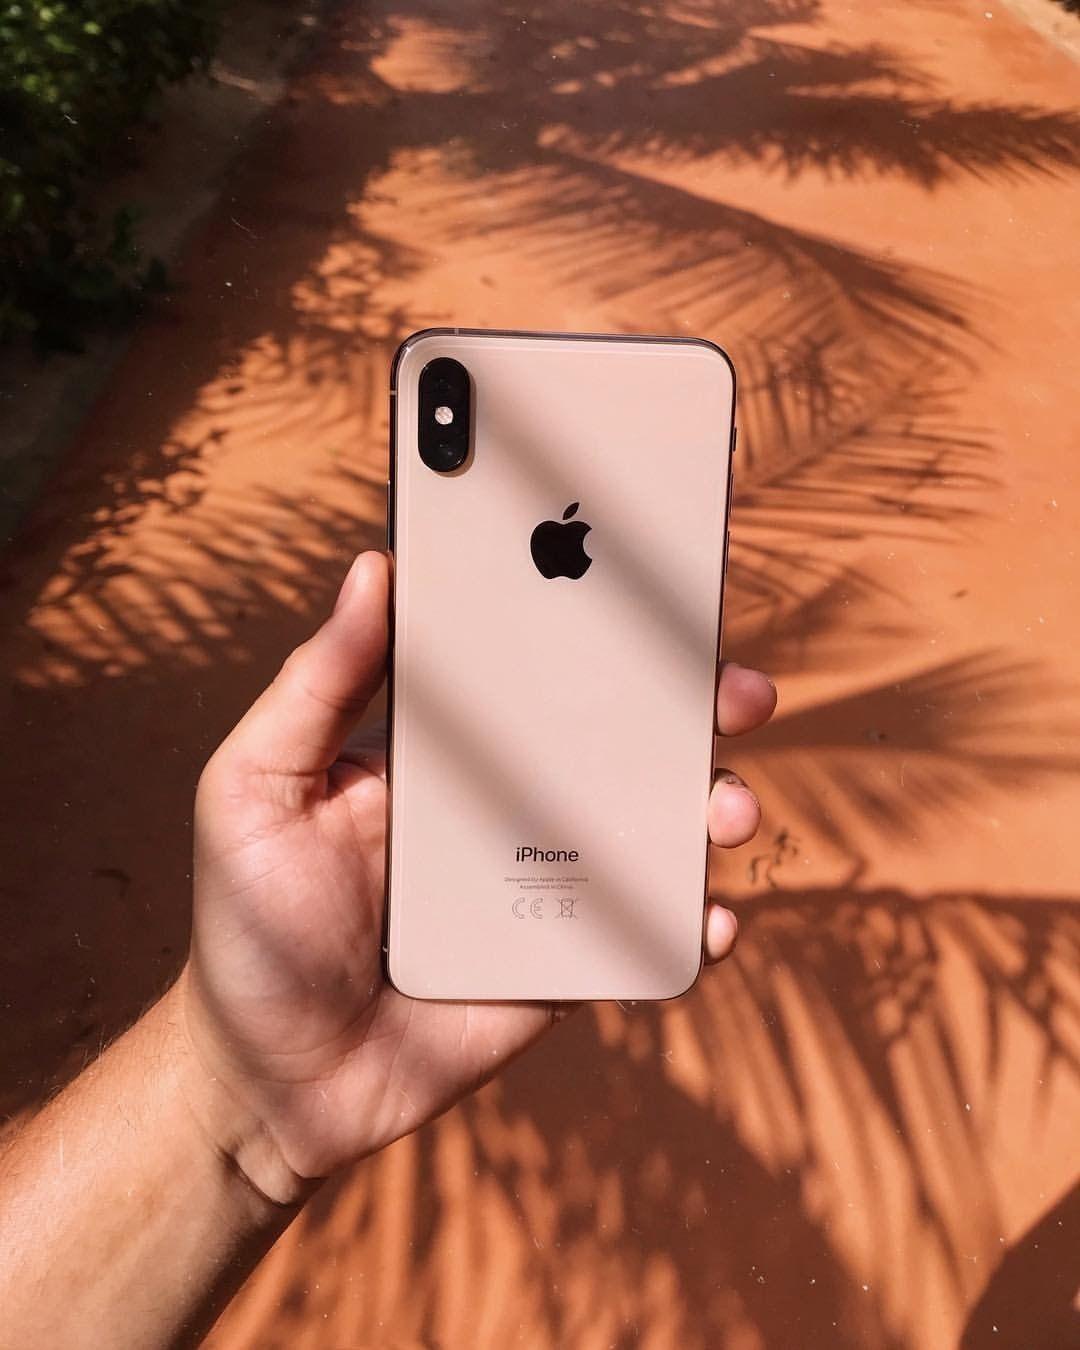 Pin By Yasmin On ɪᴘʜᴏɴᴇ Iphone Apple Iphone Apple Phone